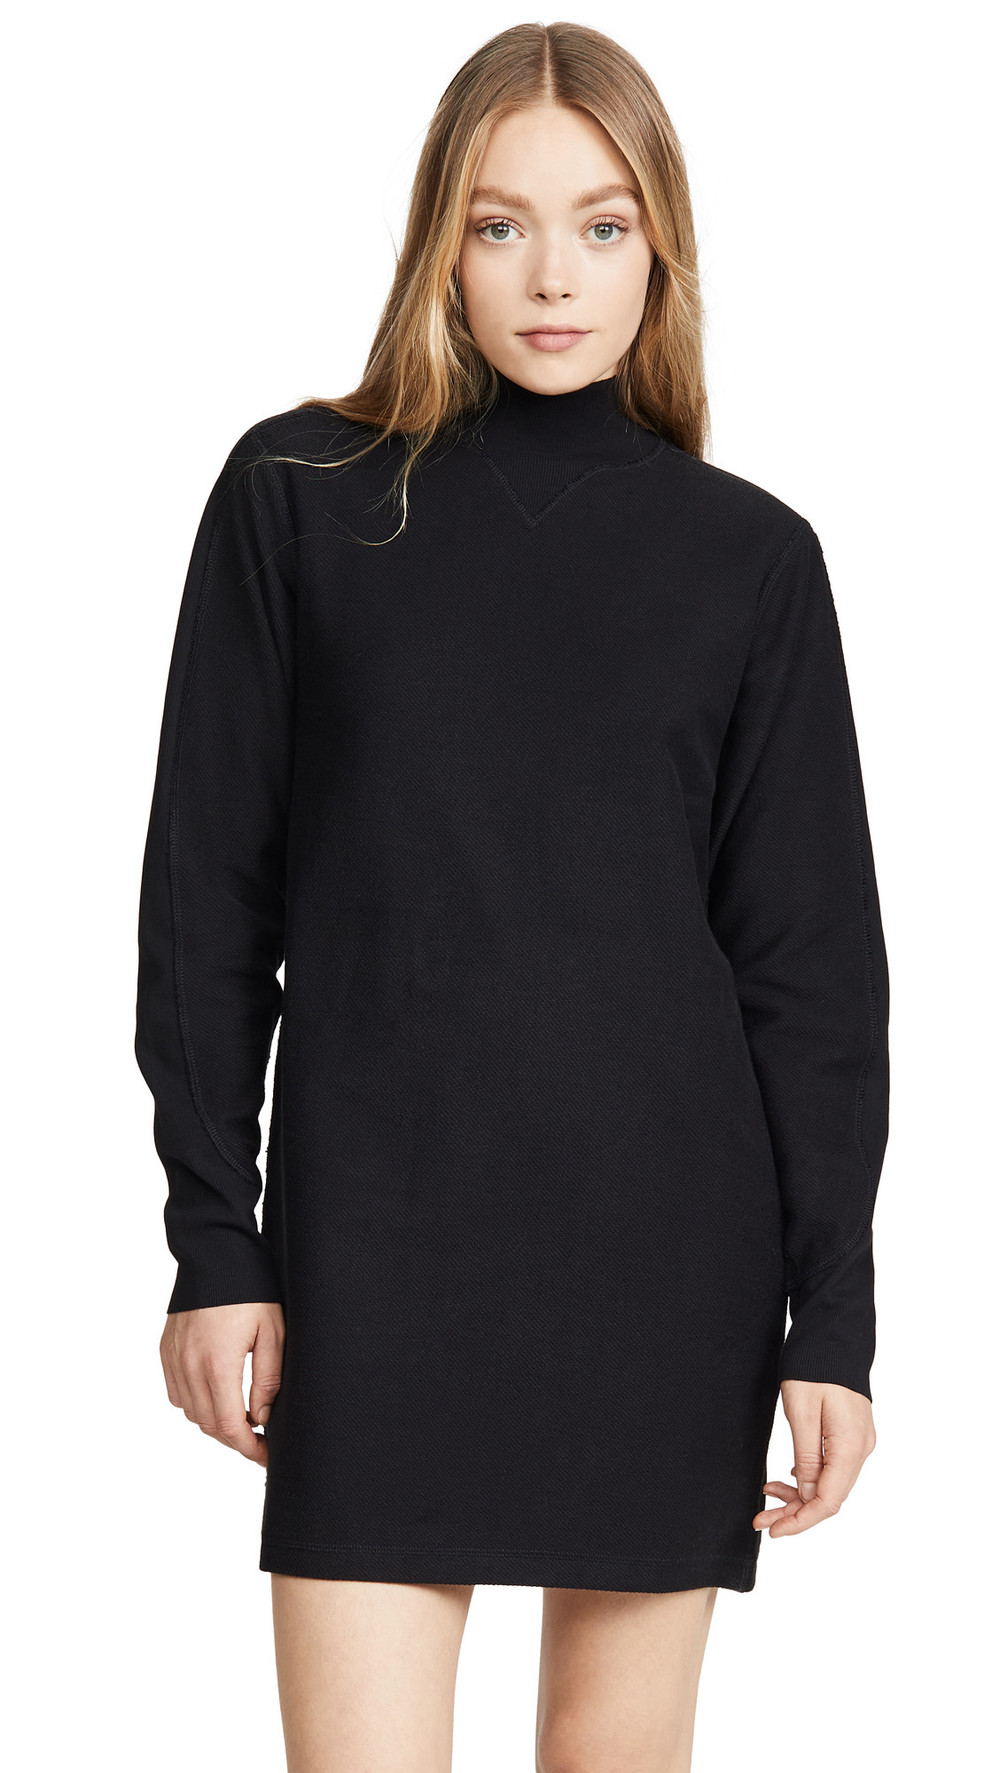 Rag & Bone/JEAN Utility Turtleneck Dress in black